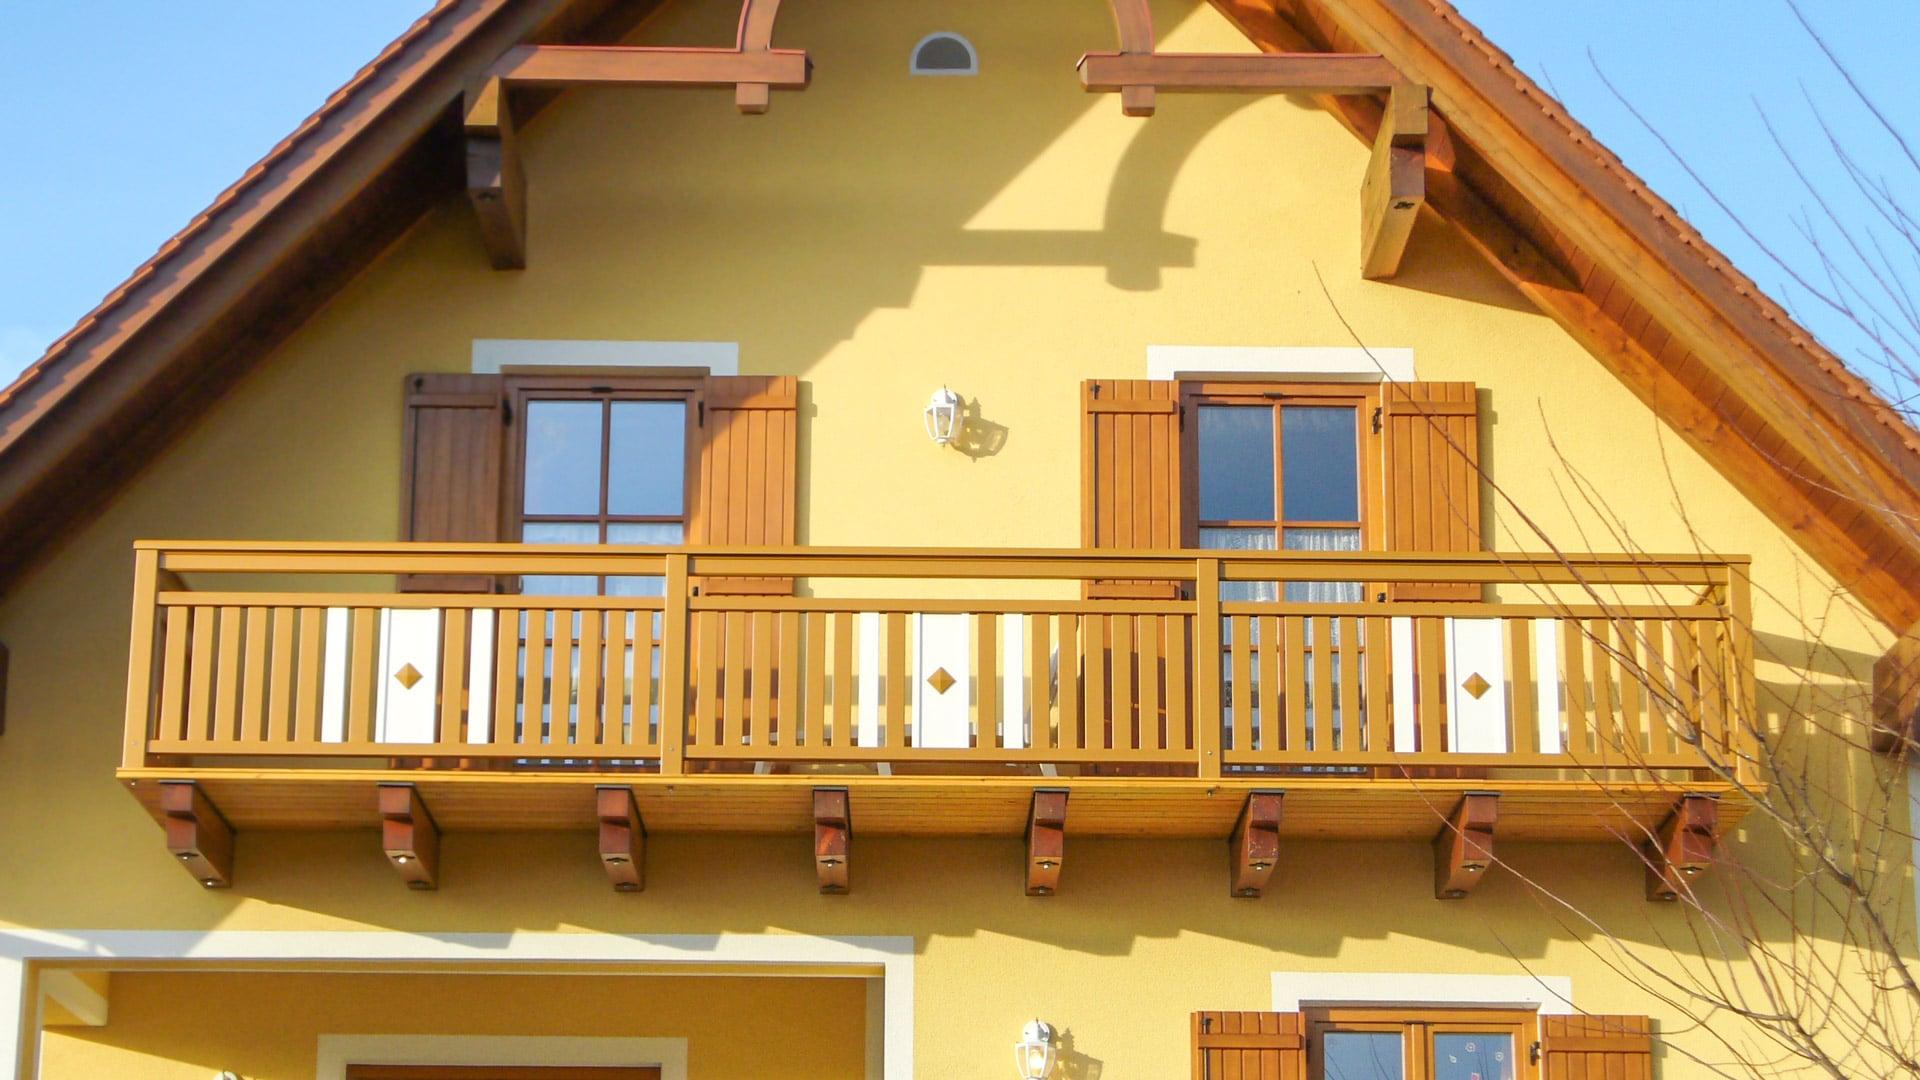 Krieglach 20 a   Aluminium-Balkon mit Latten weiß-braun vertikal, Blech mit Knopf mittig   Svoboda